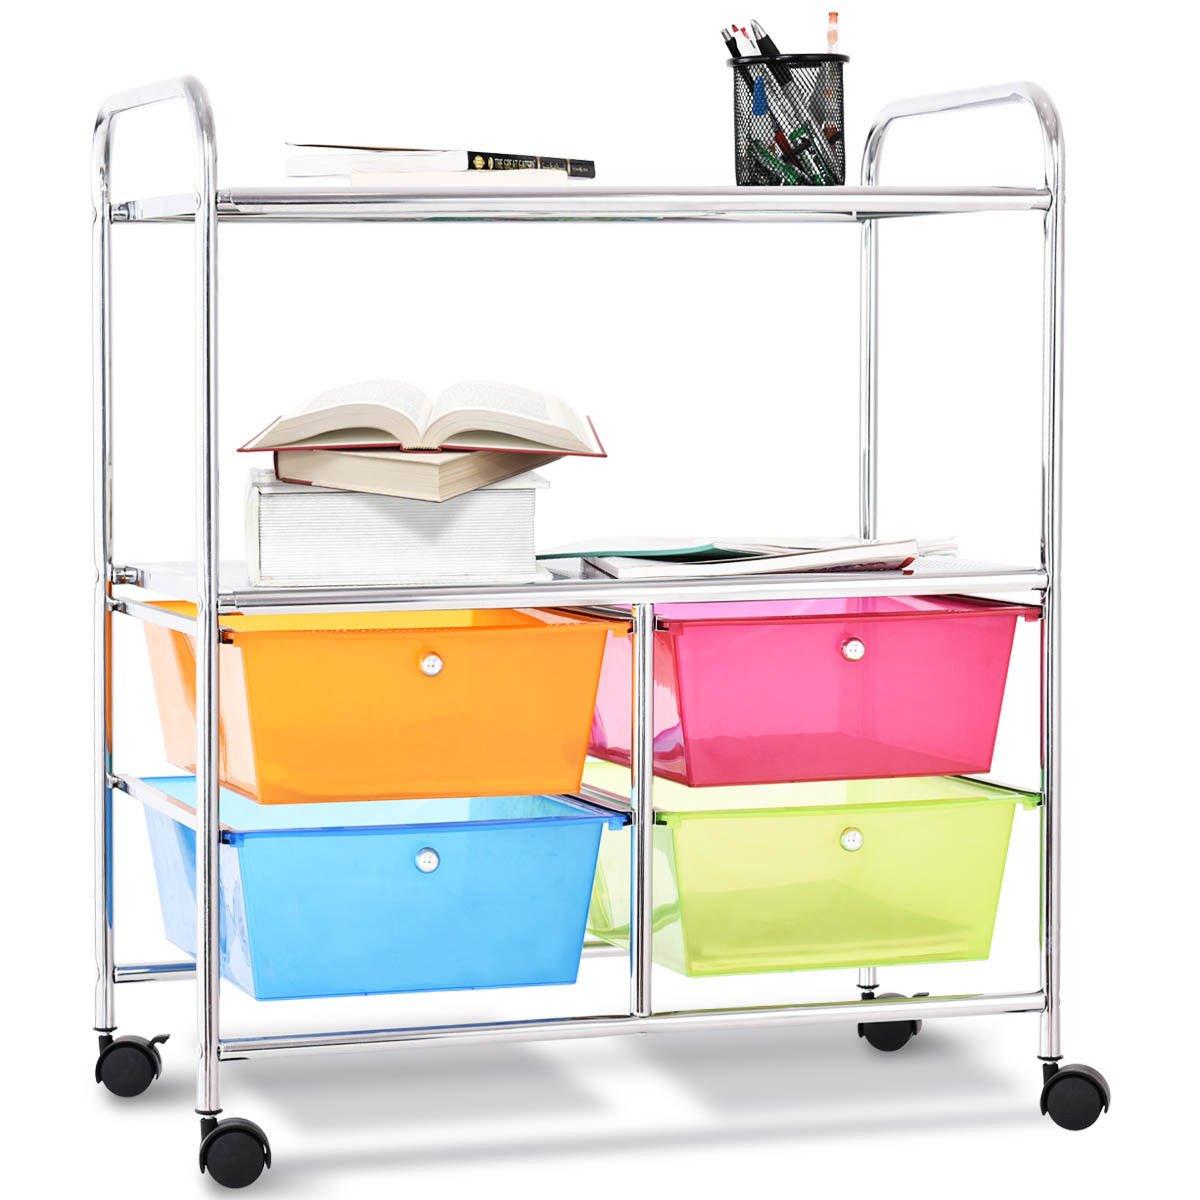 Giantex Rolling Storage Cart w/ 4 Drawers 2 Shelves Metal Rack Shelf Home Office School Beauty Salon Utility Organizer Cart with Wheels (Blue Green Orange & Red) by Giantex (Image #2)